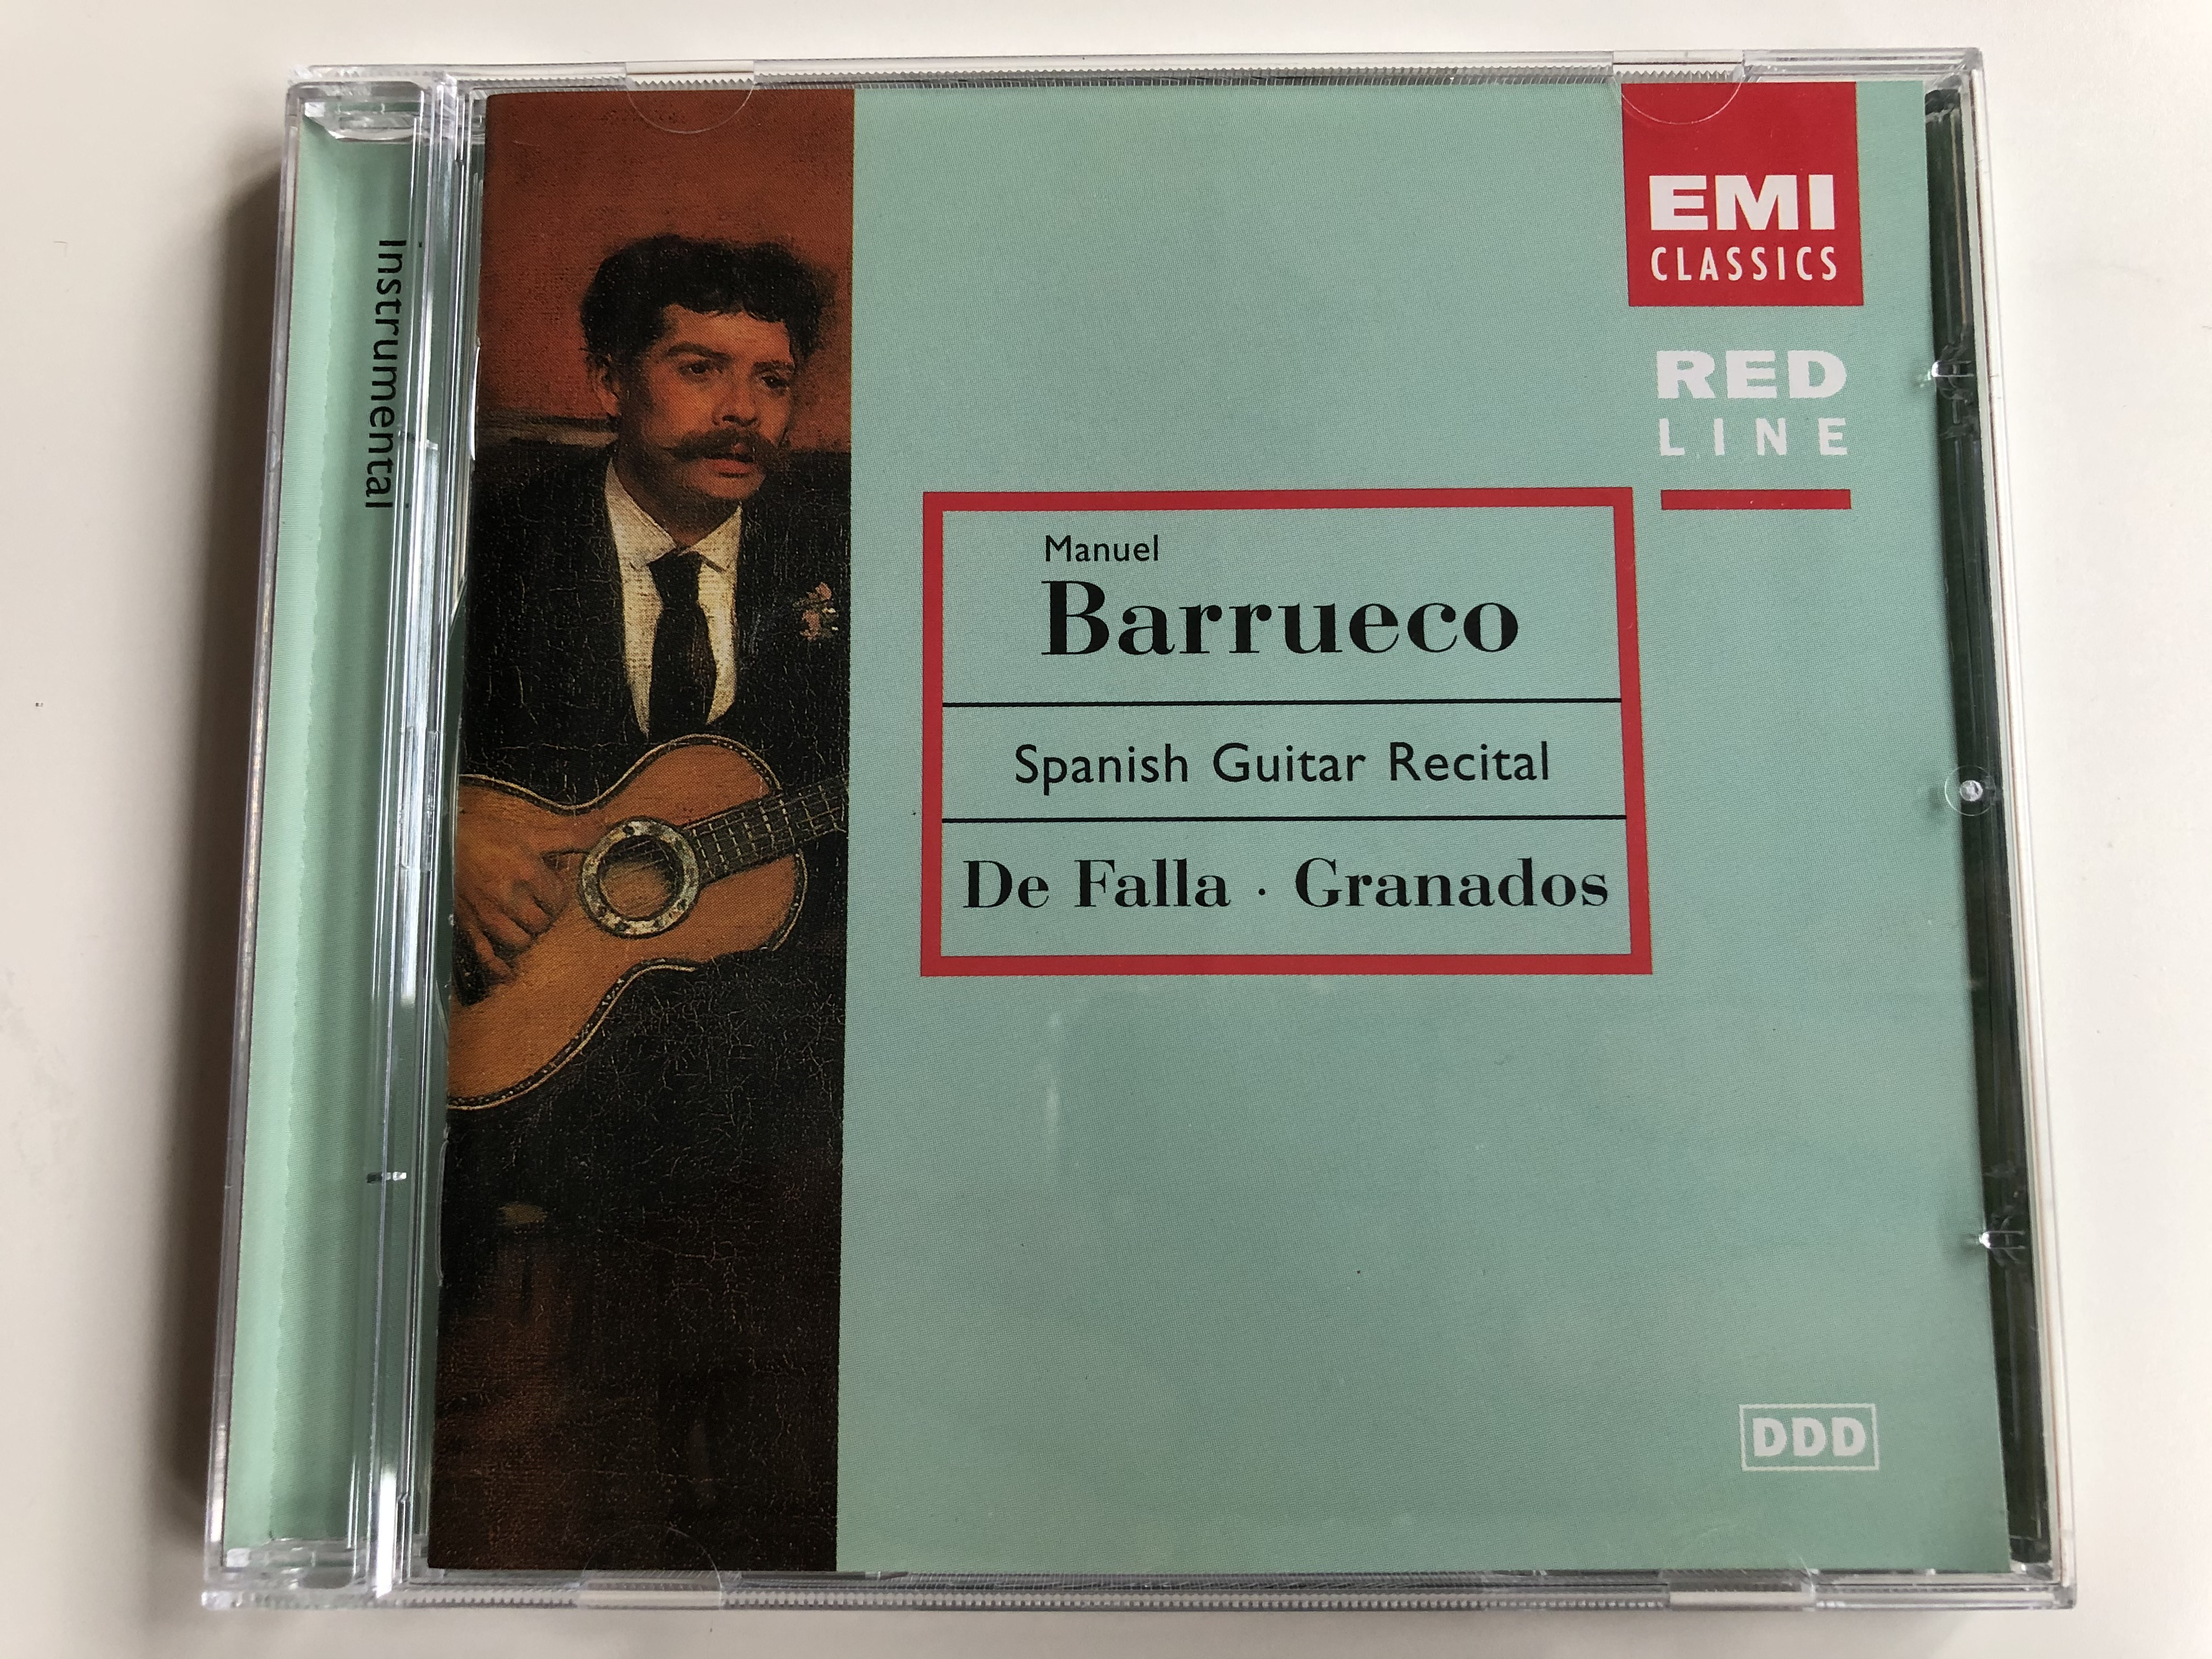 manuel-barrueco-spanish-guitar-recital-de-falla-granados-emi-classic-audio-cd-1997-stereo-724356985025-1-.jpg